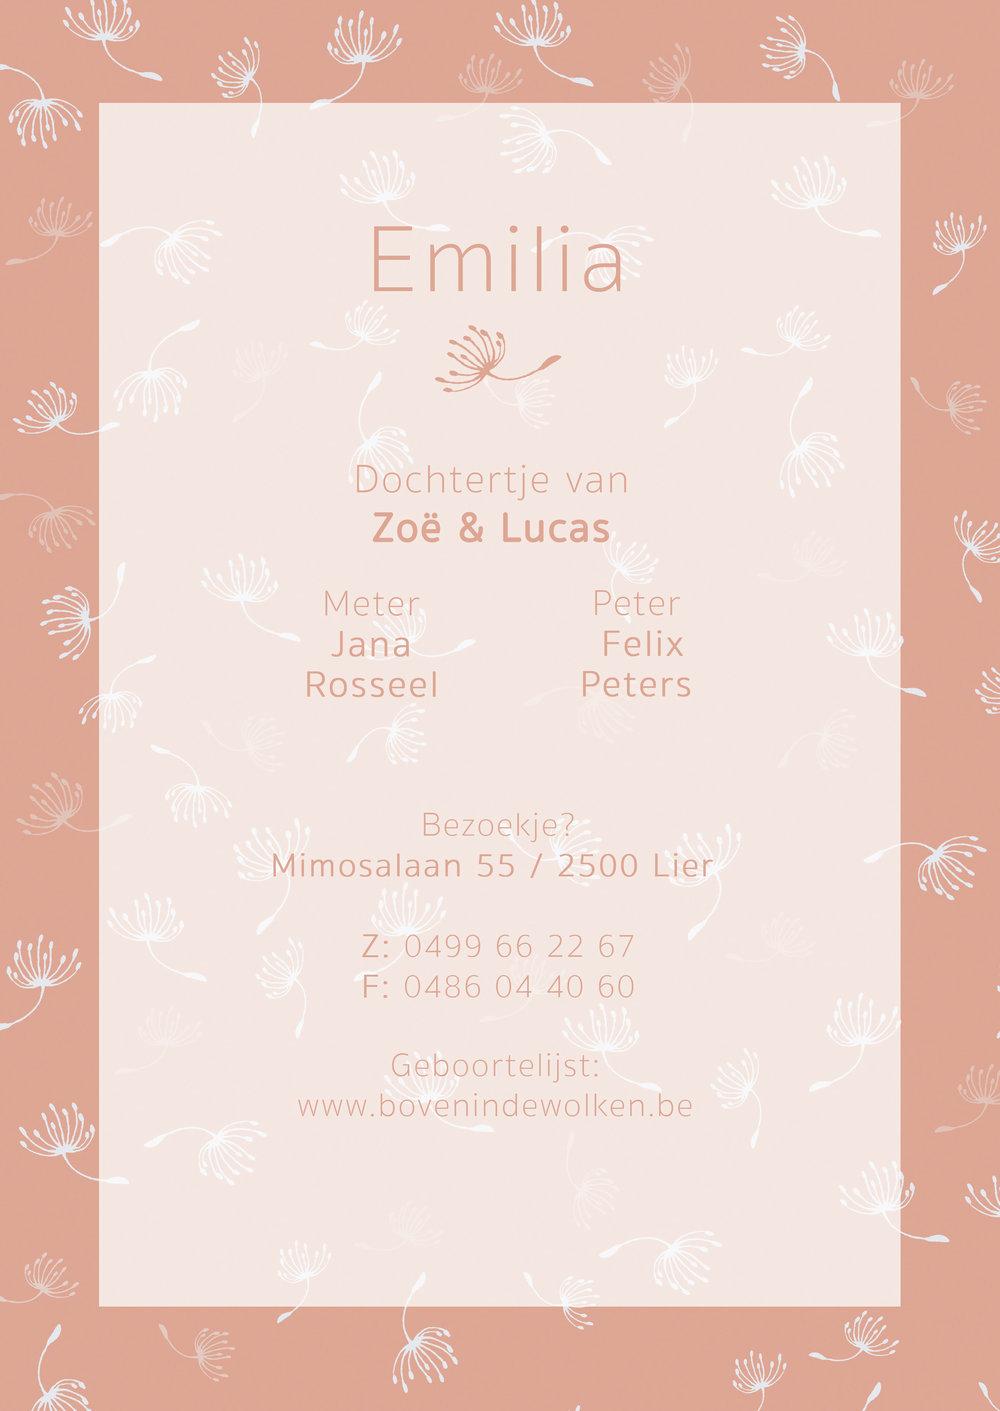 Emilia achter.jpg